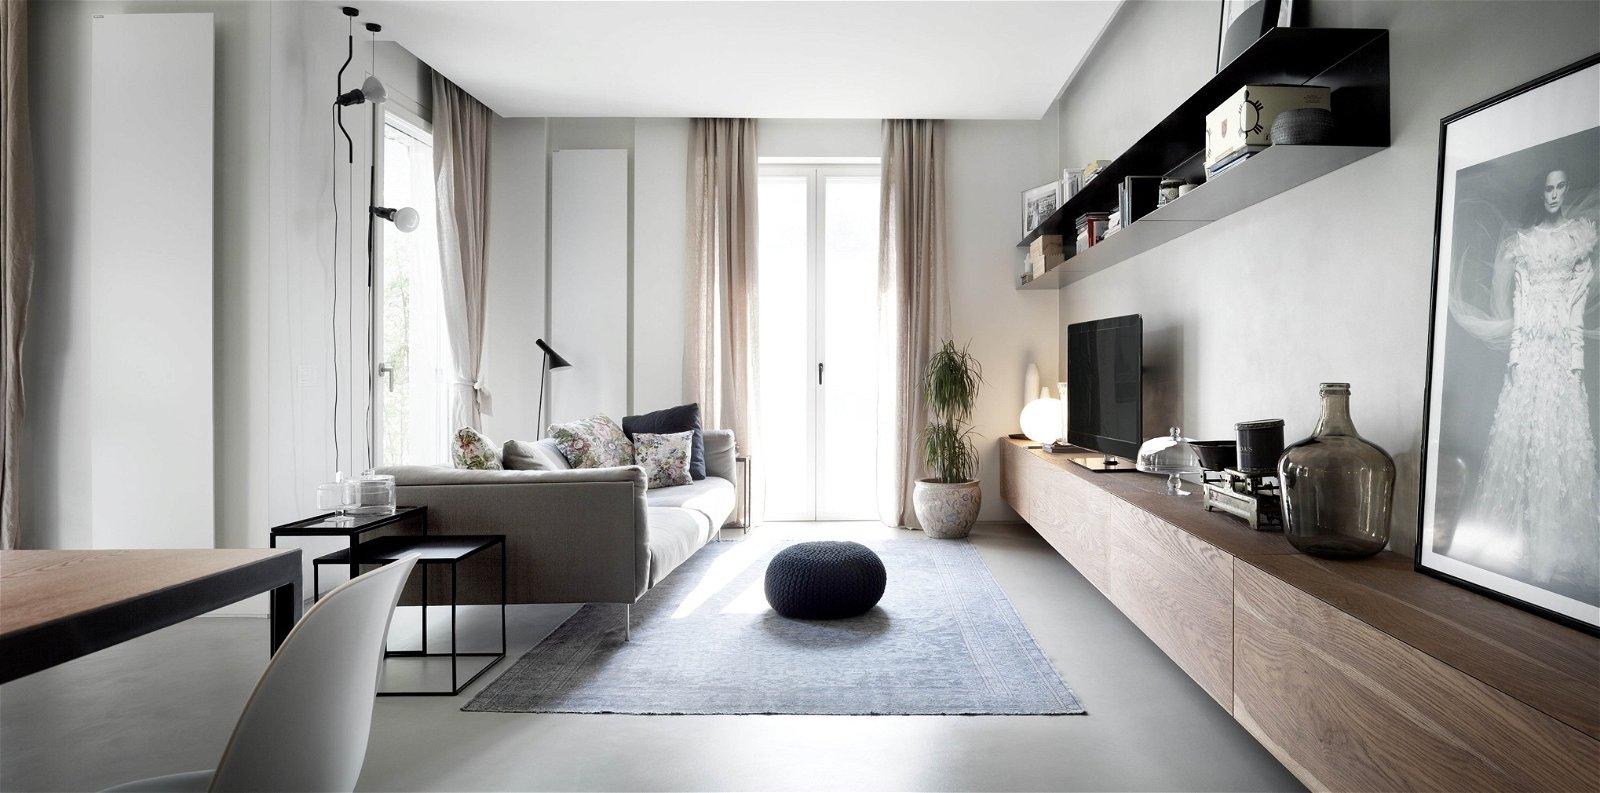 Online Interior Design Help Affordable Decorating Services